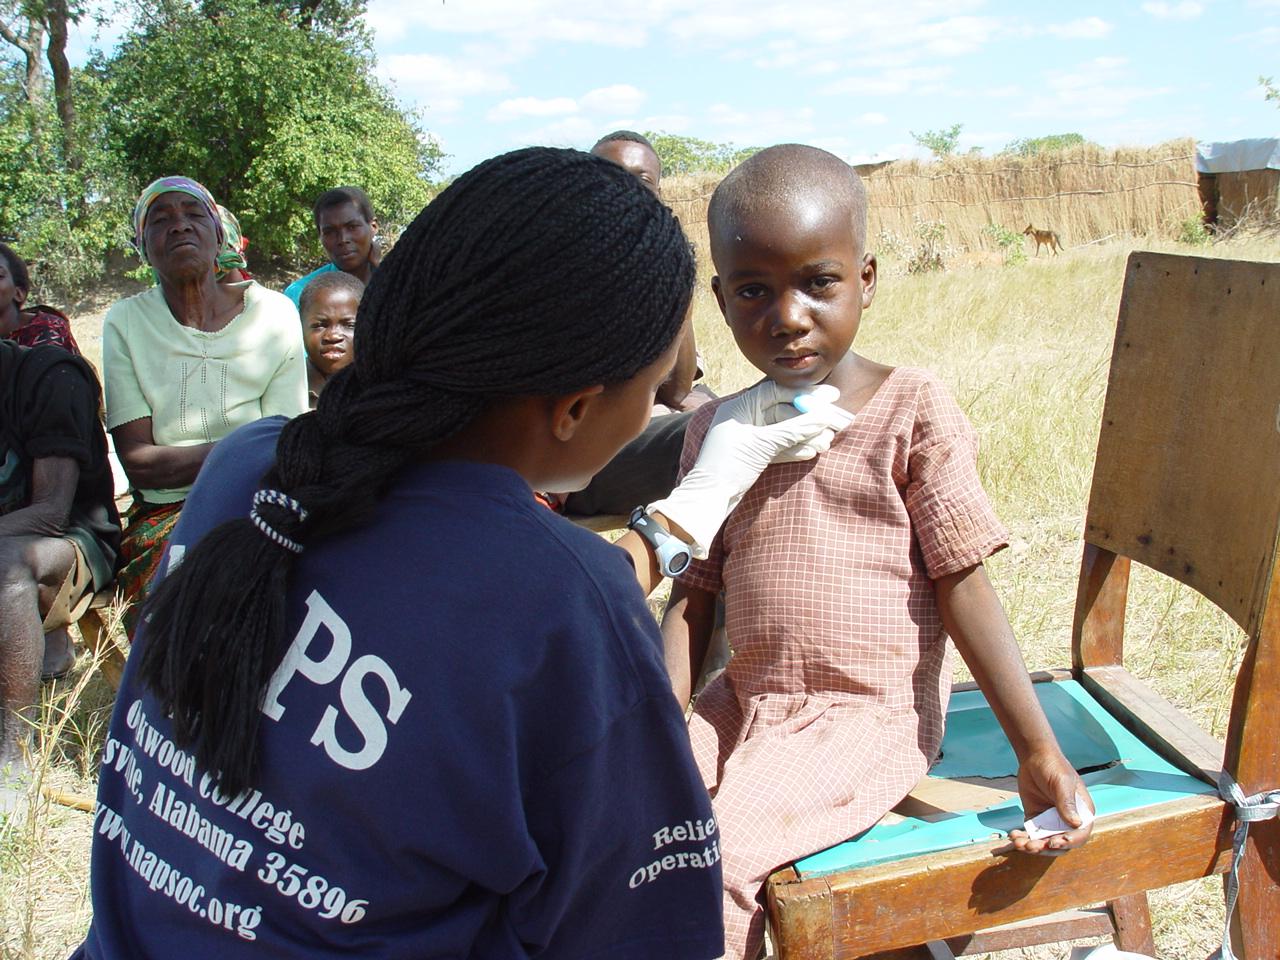 Picture zambia2 039.jpg